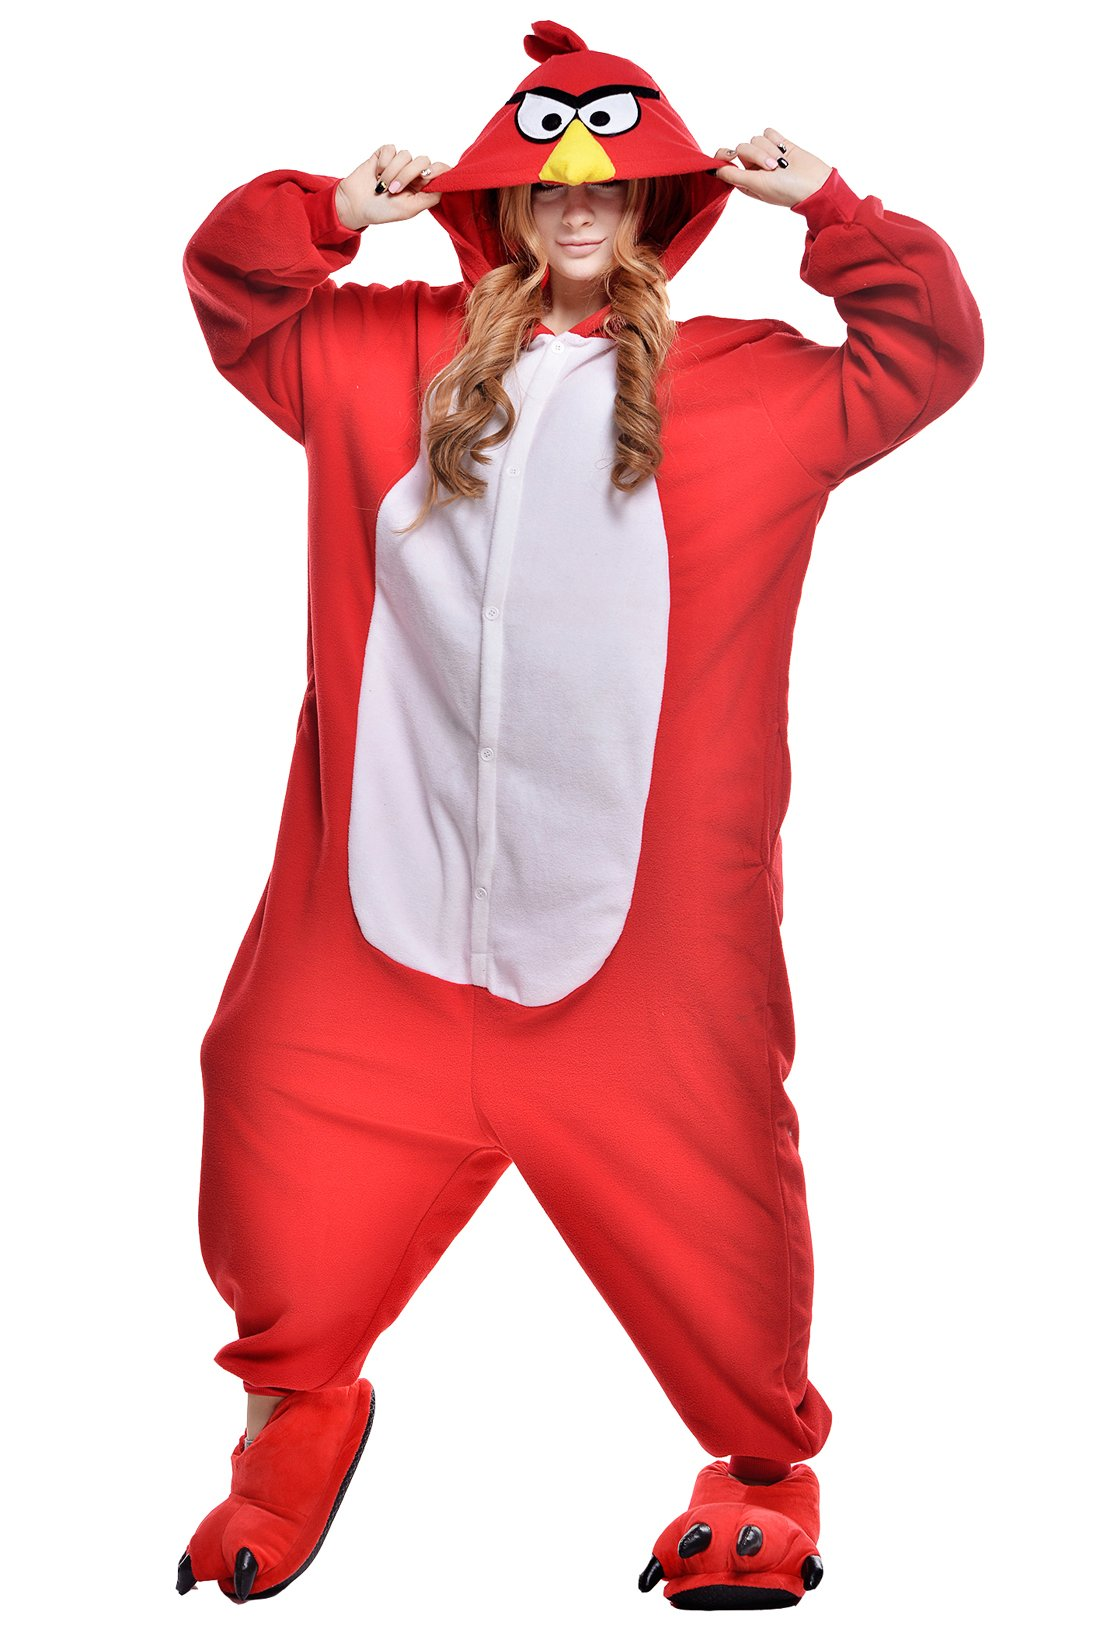 Adult Red Angry Bird Onesie Pajamas Kigurumi Halloween Cosplay Costume